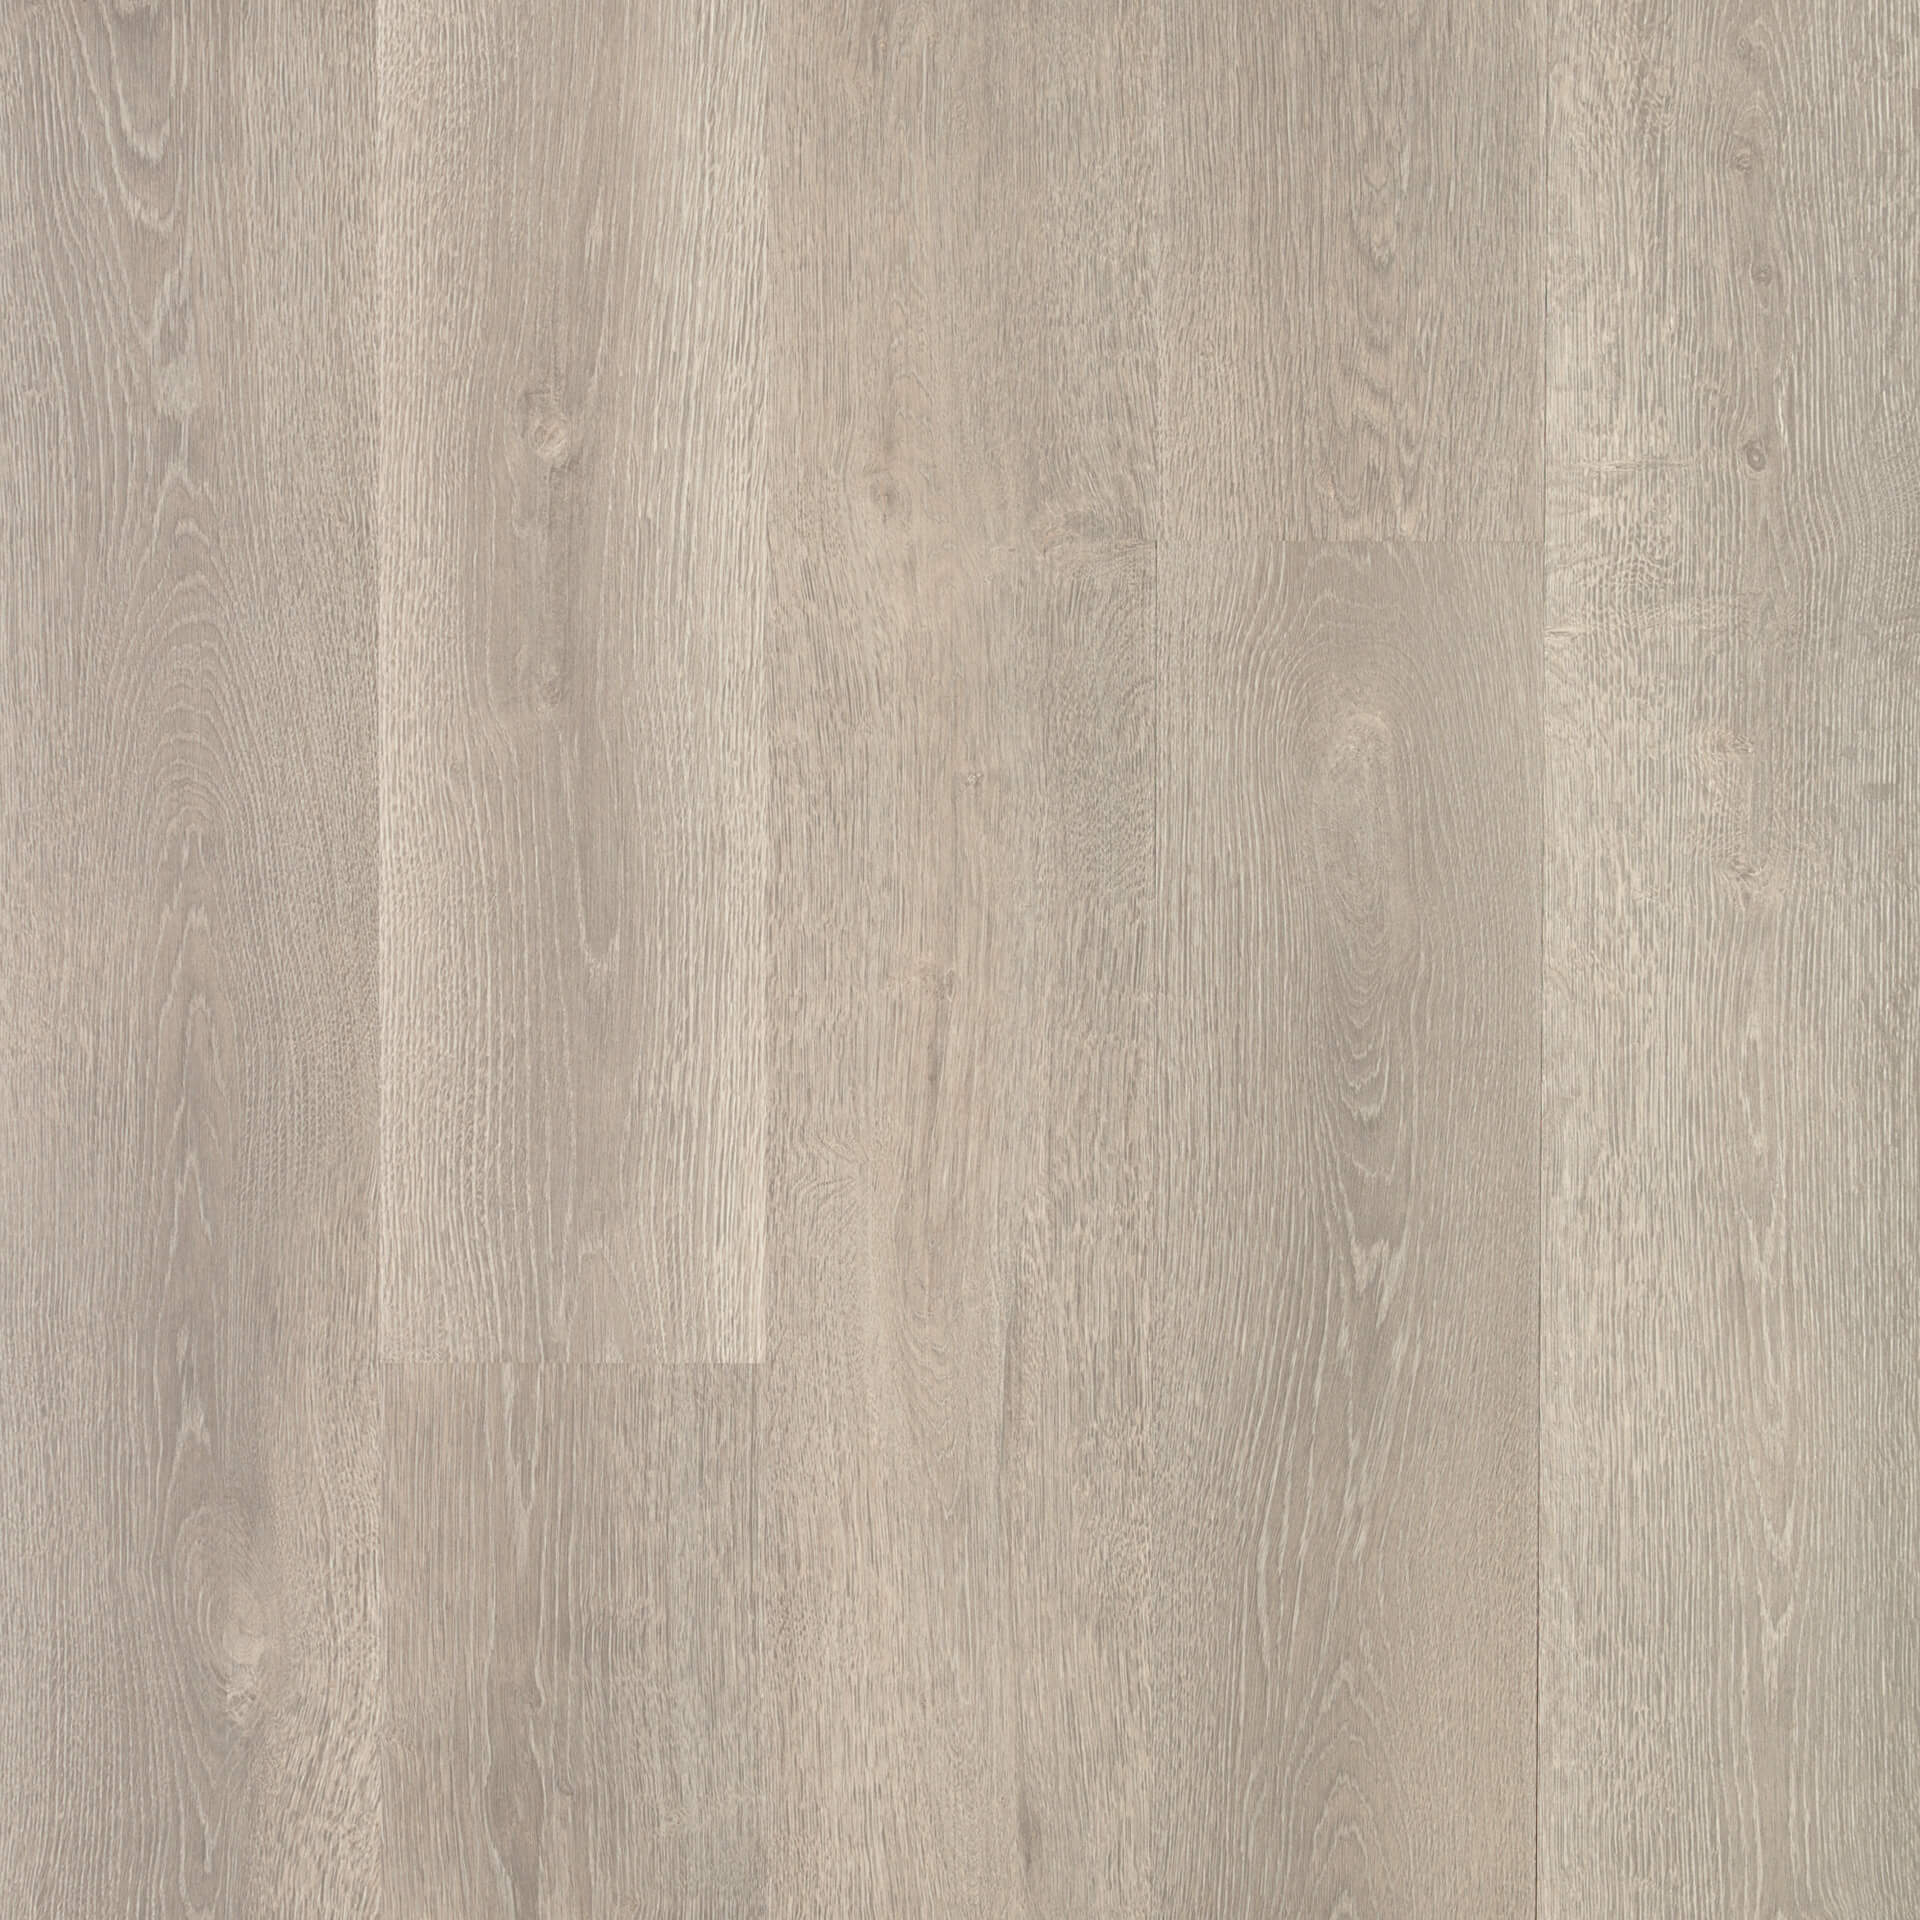 Lili Oak Styleo Collection Laminate